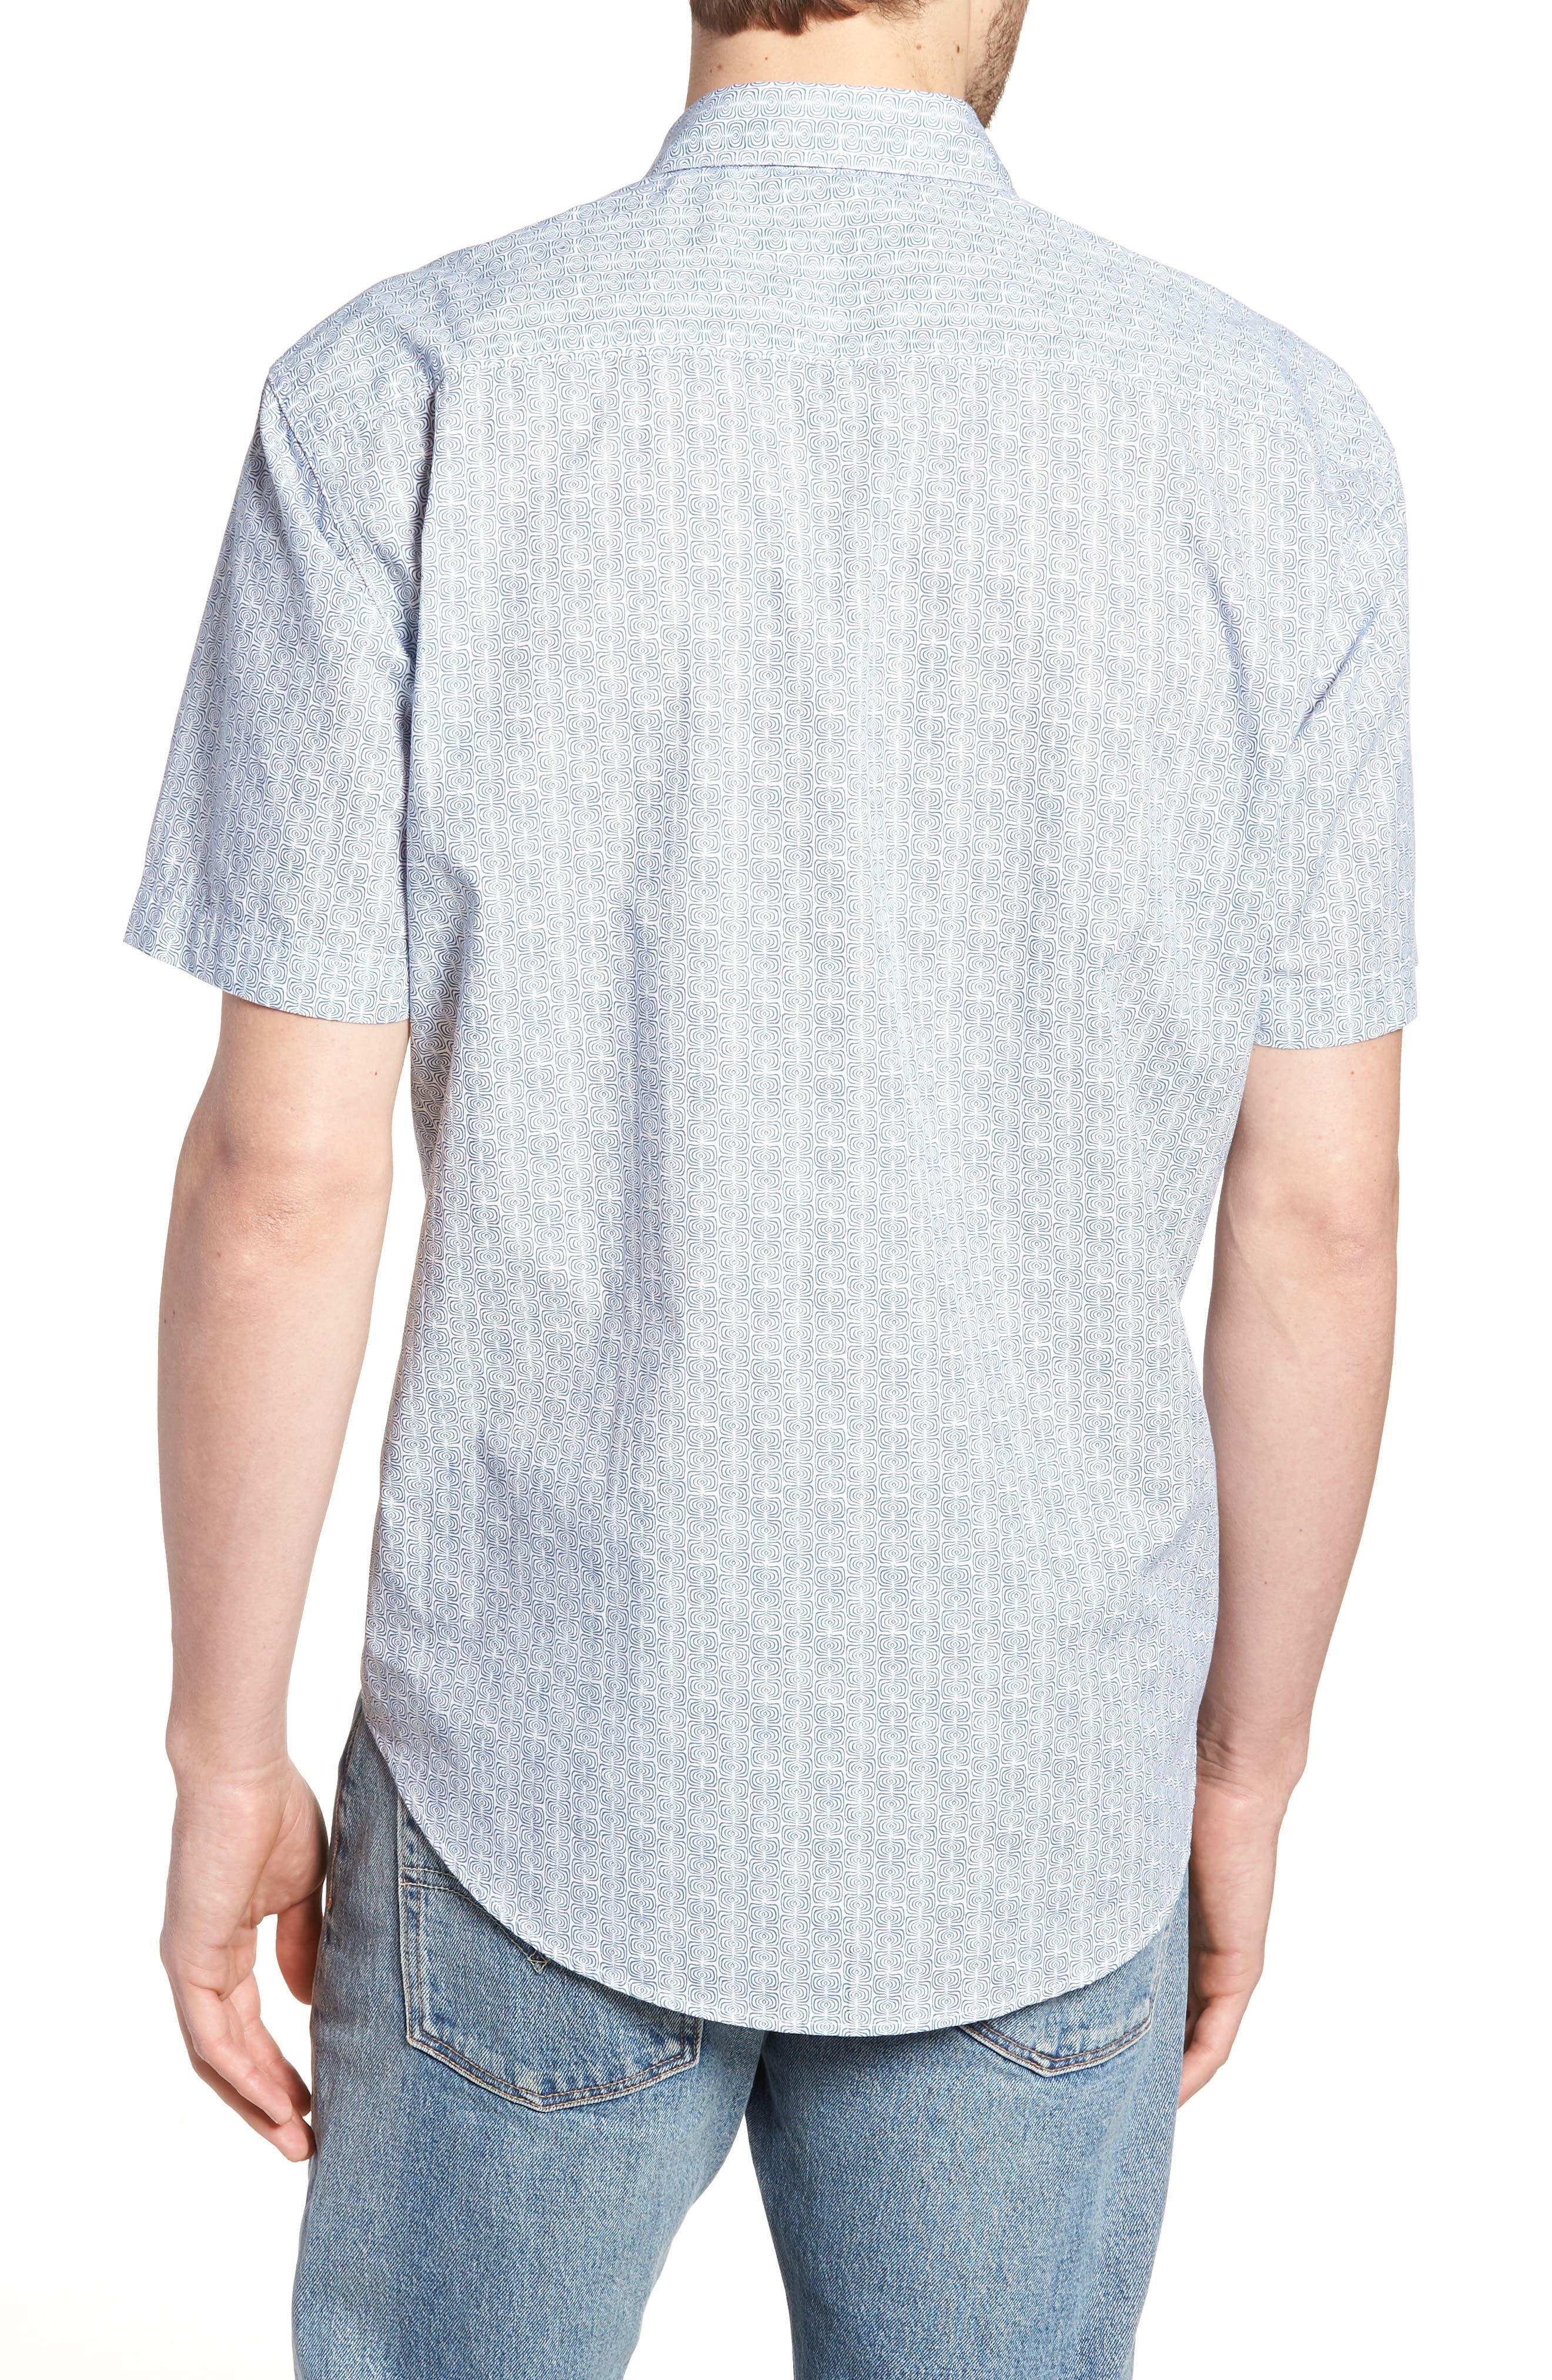 Jacurre Regular Fit Short Sleeve Sport Shirt,                             Alternate thumbnail 2, color,                             462